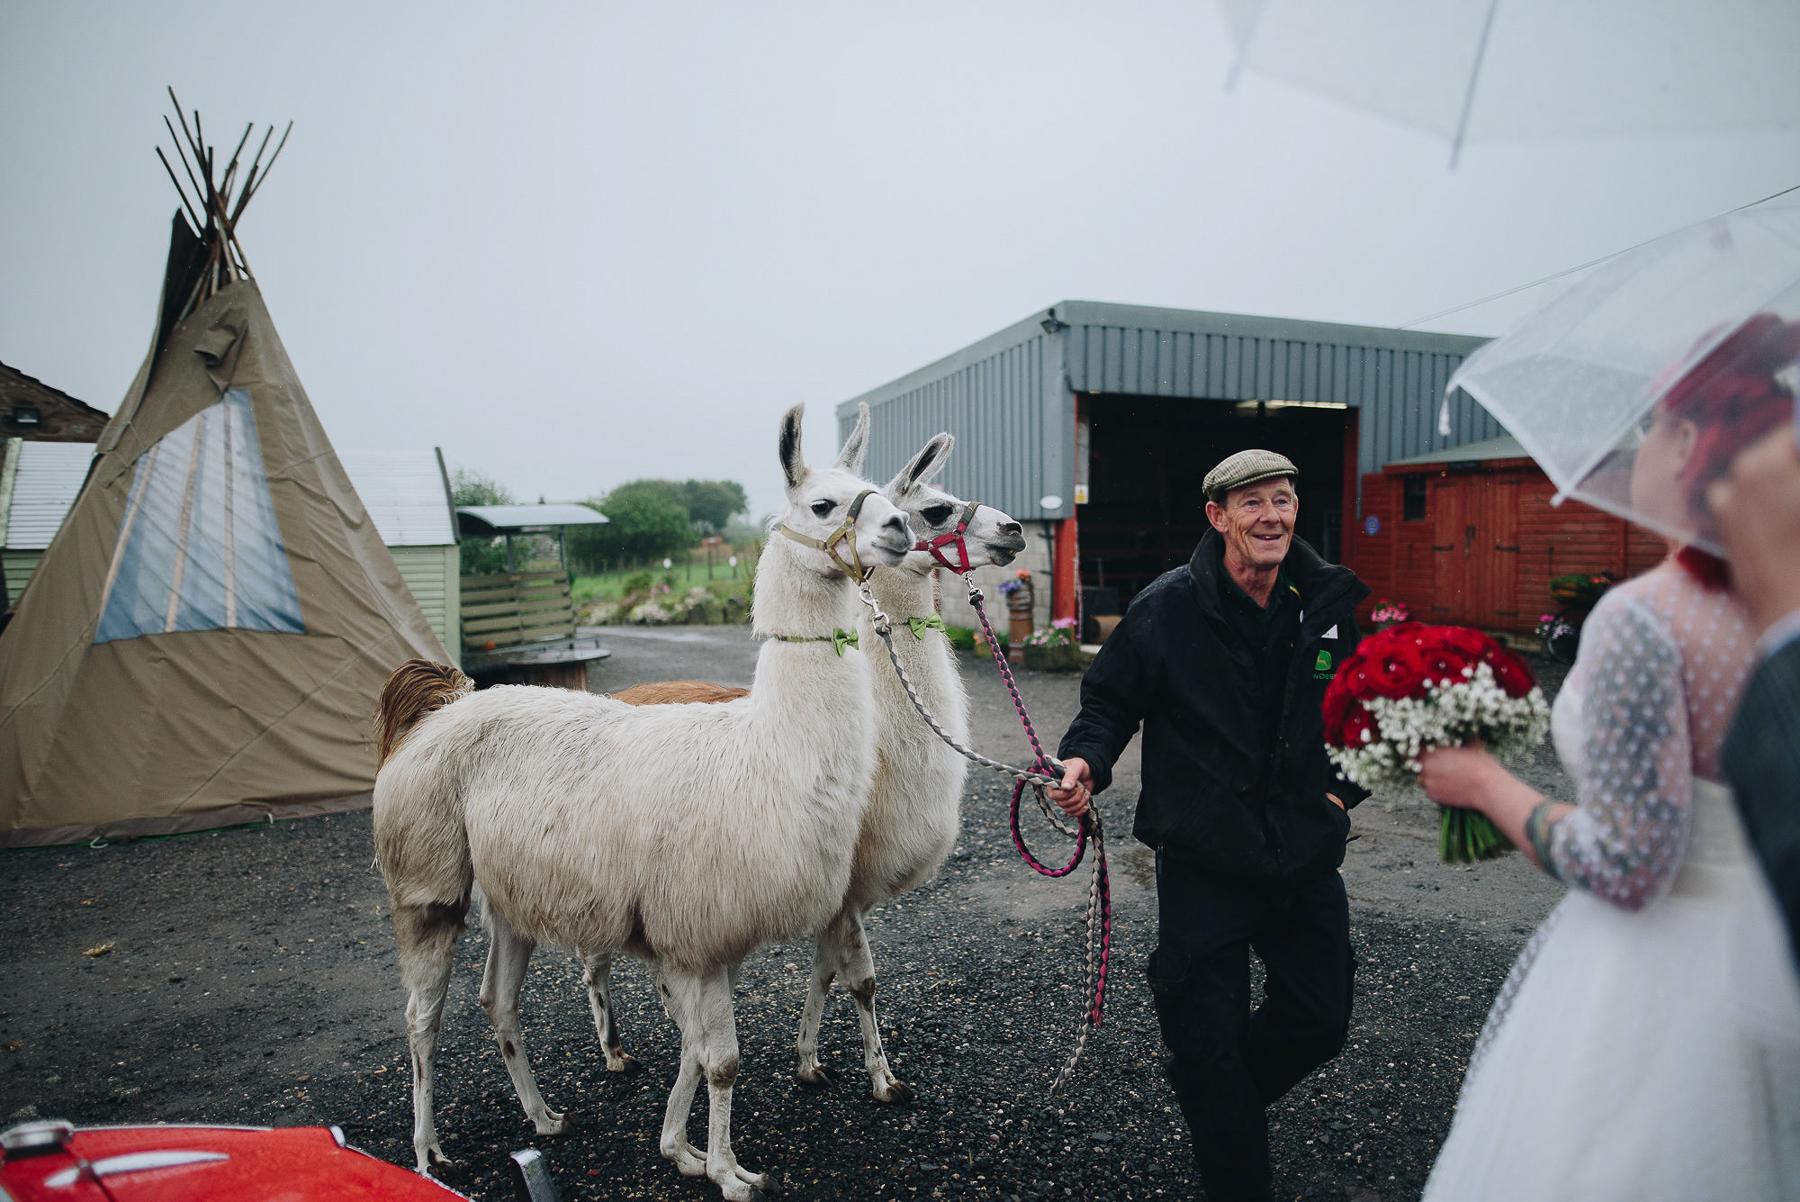 Wellbeing_Farm_Wedding_Photography_The_Pin-Up_Bride_Lara_Shaun-76.jpg